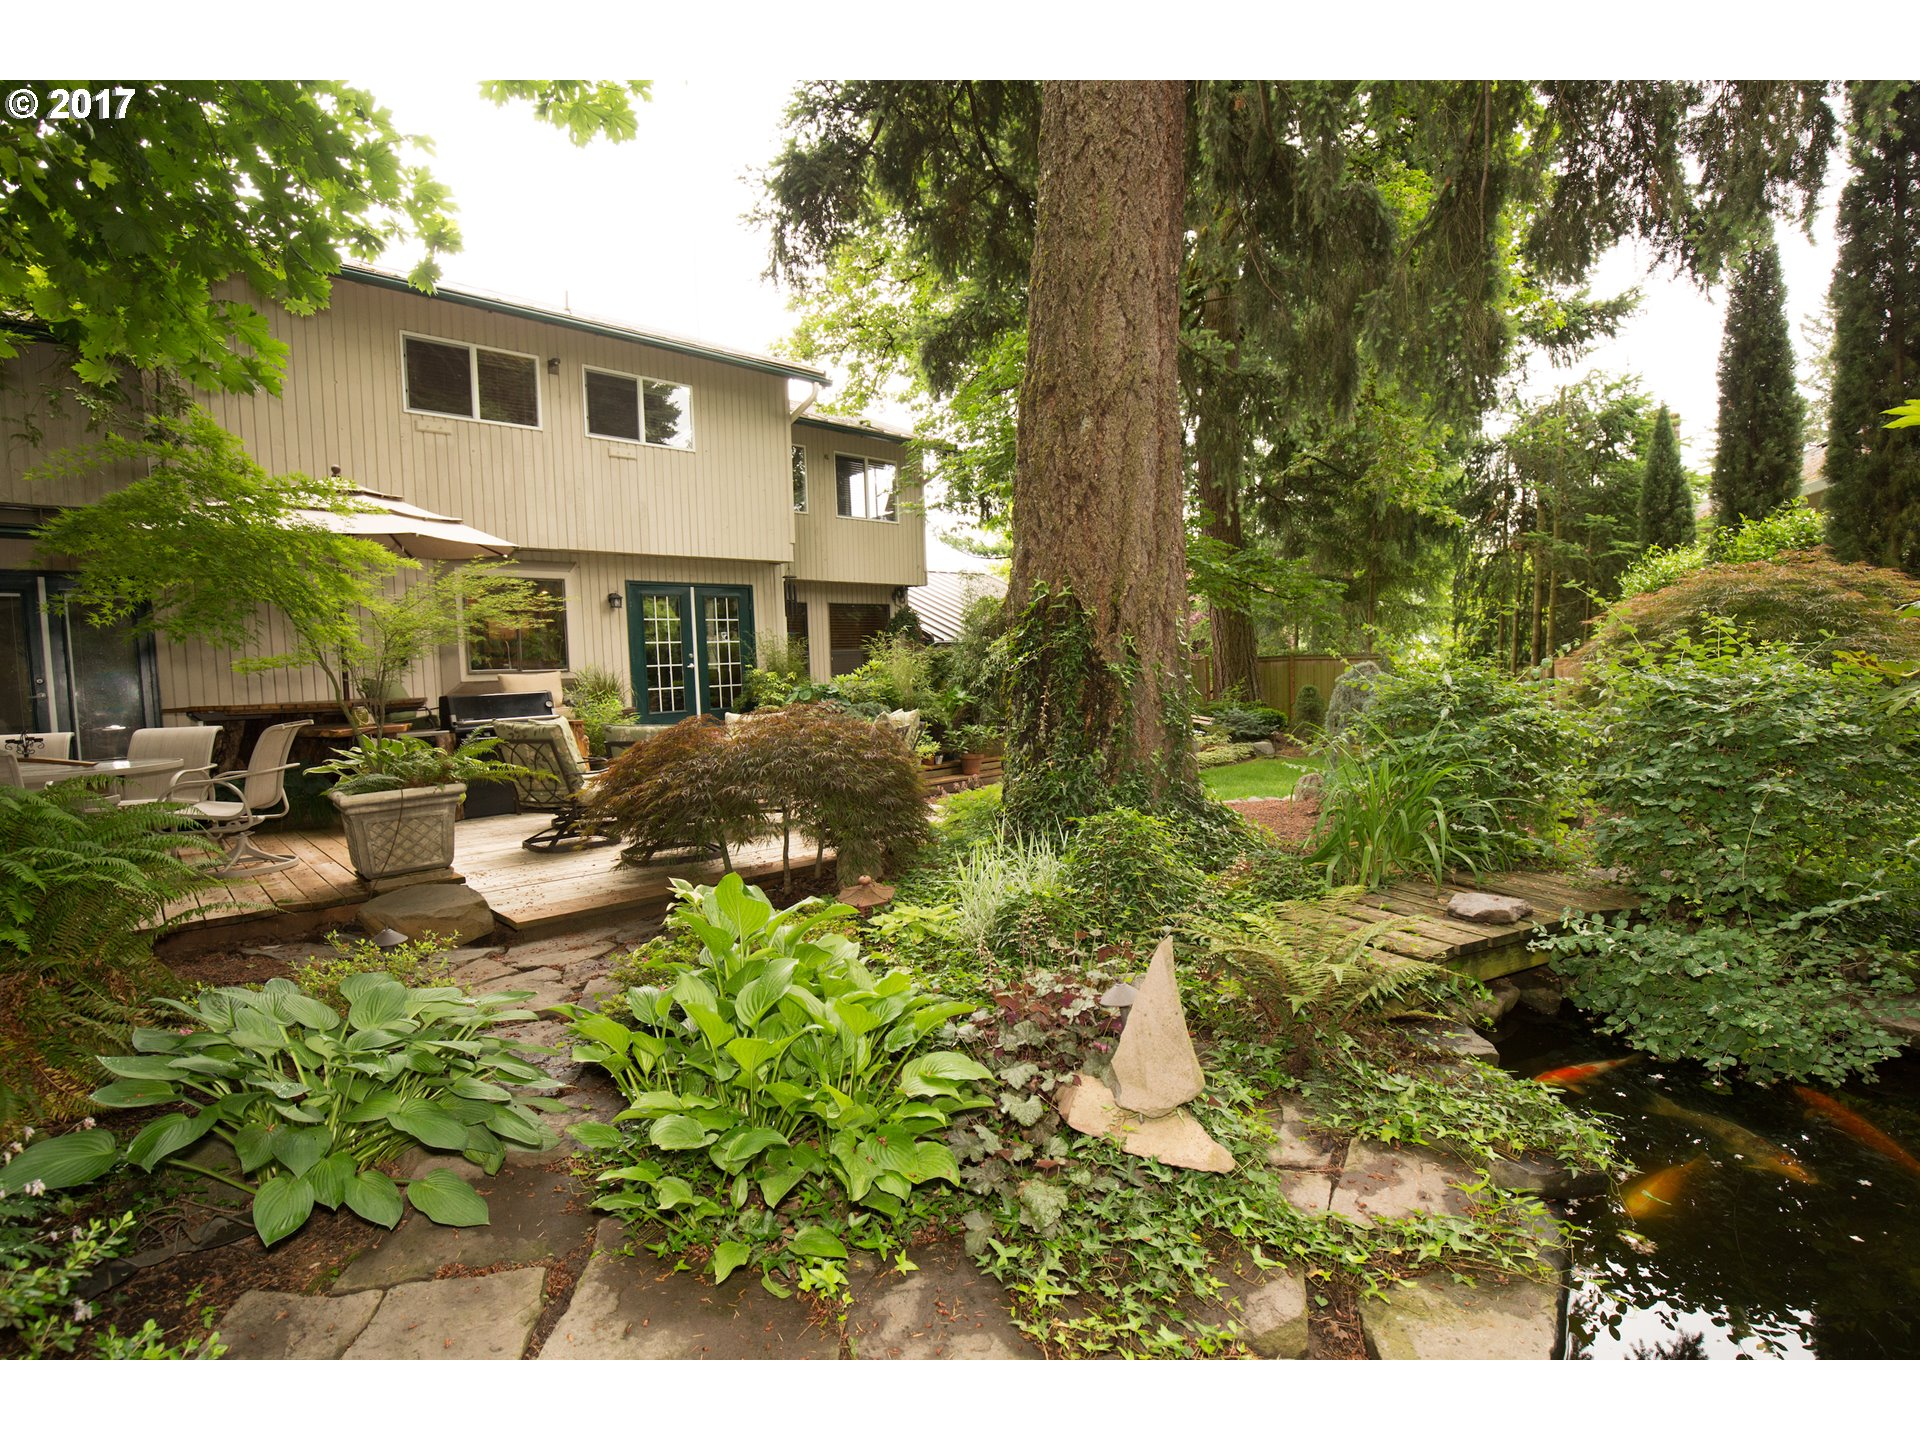 1412 SE 120TH AVE Vancouver, WA 98683 - MLS #: 17592786